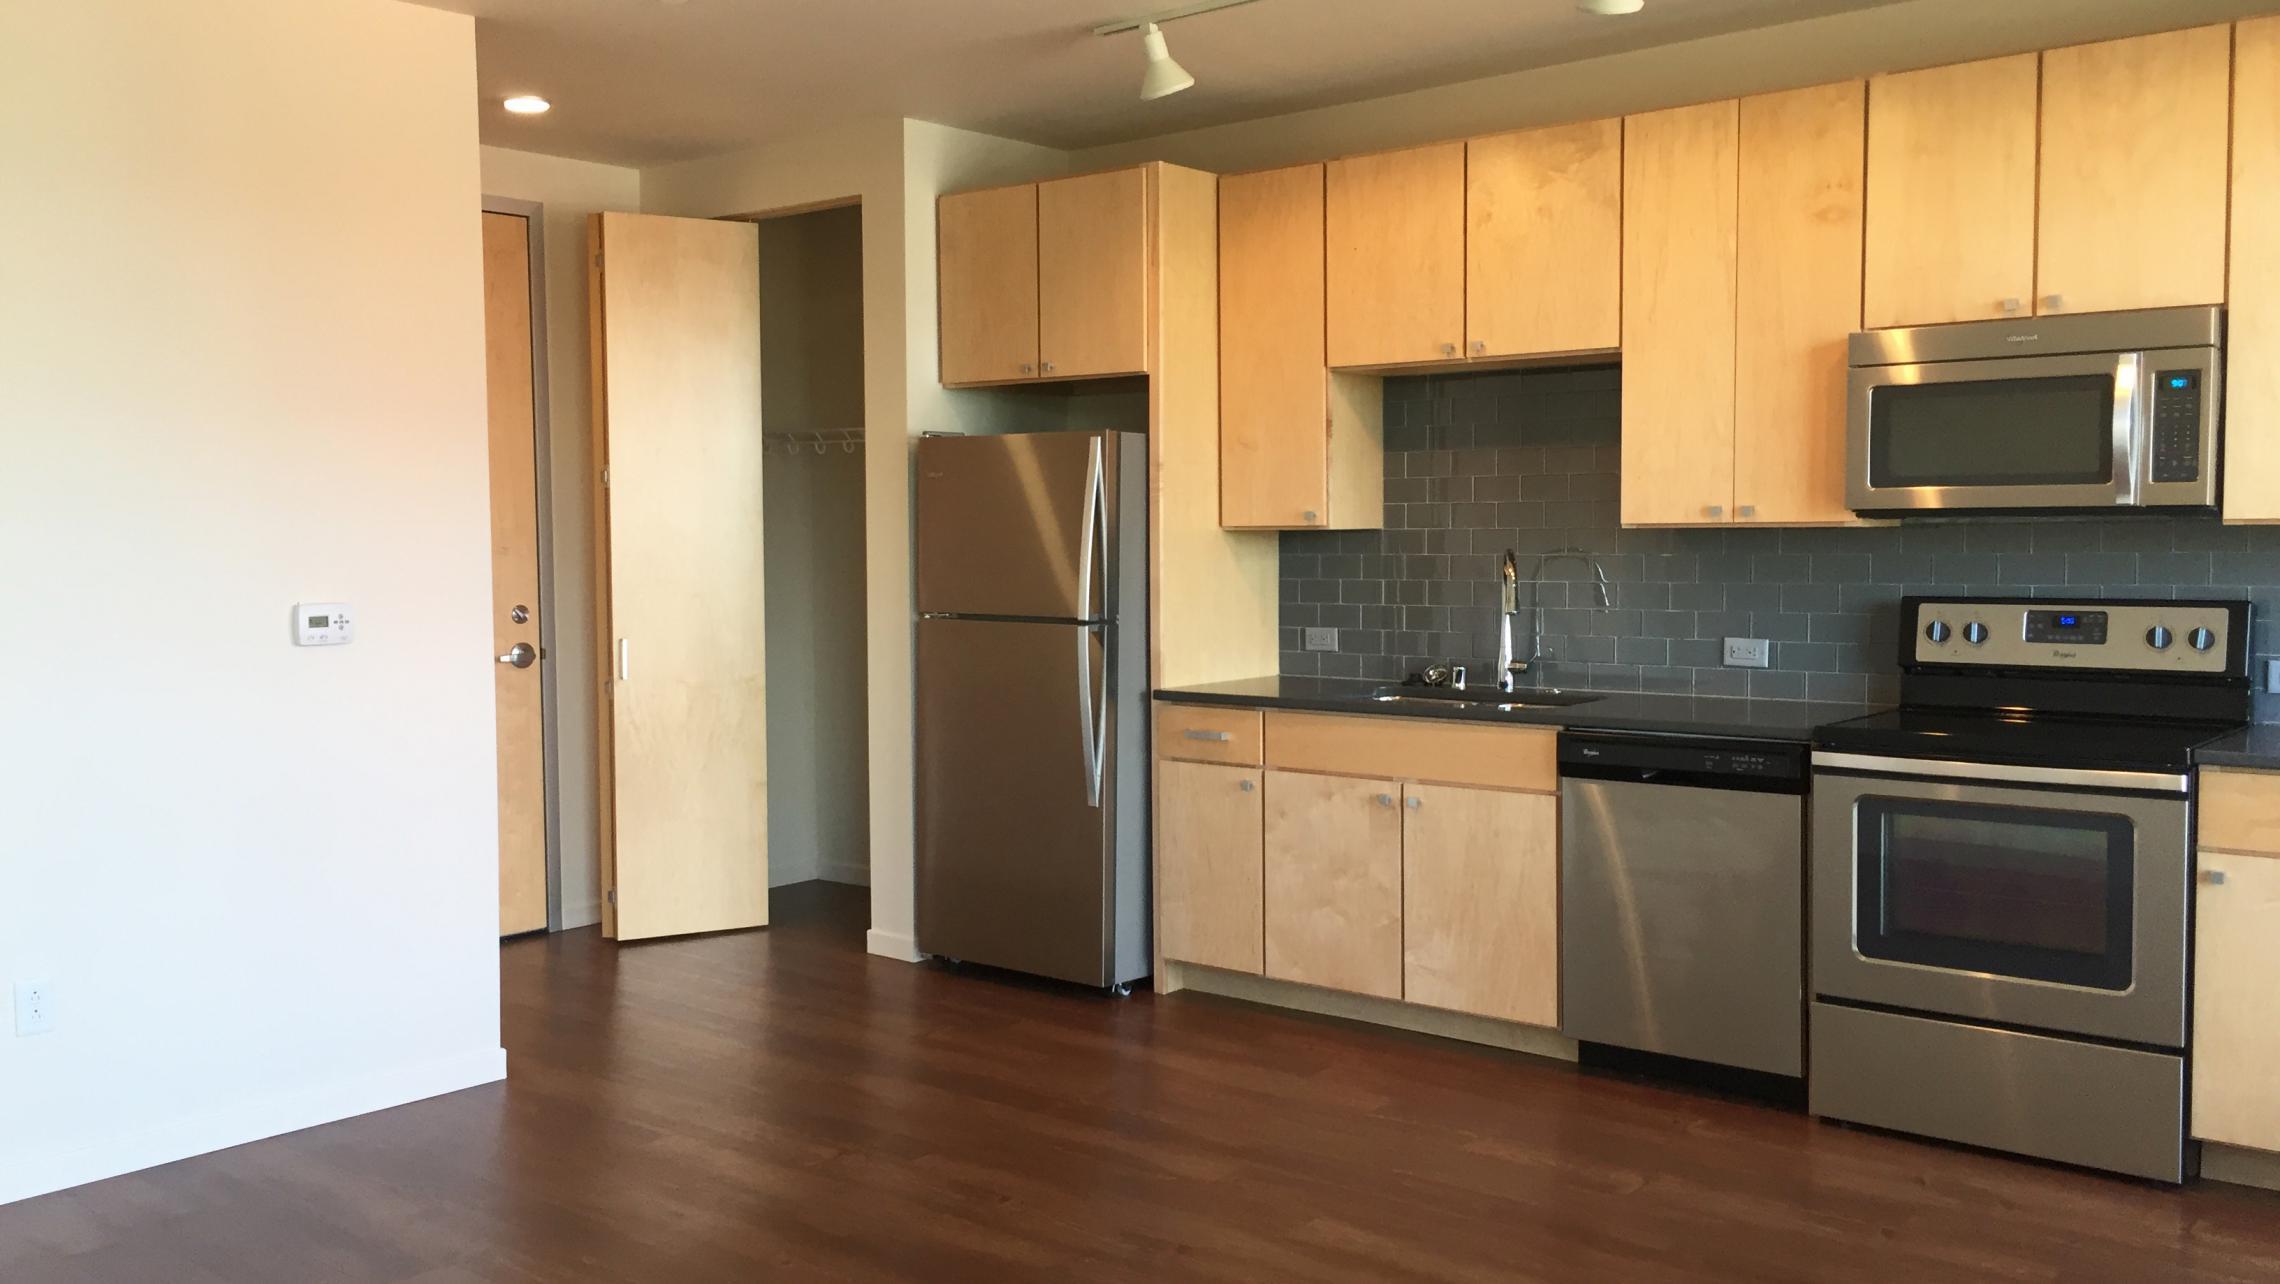 ULI Nine Line Apartment 212 - Kitchen